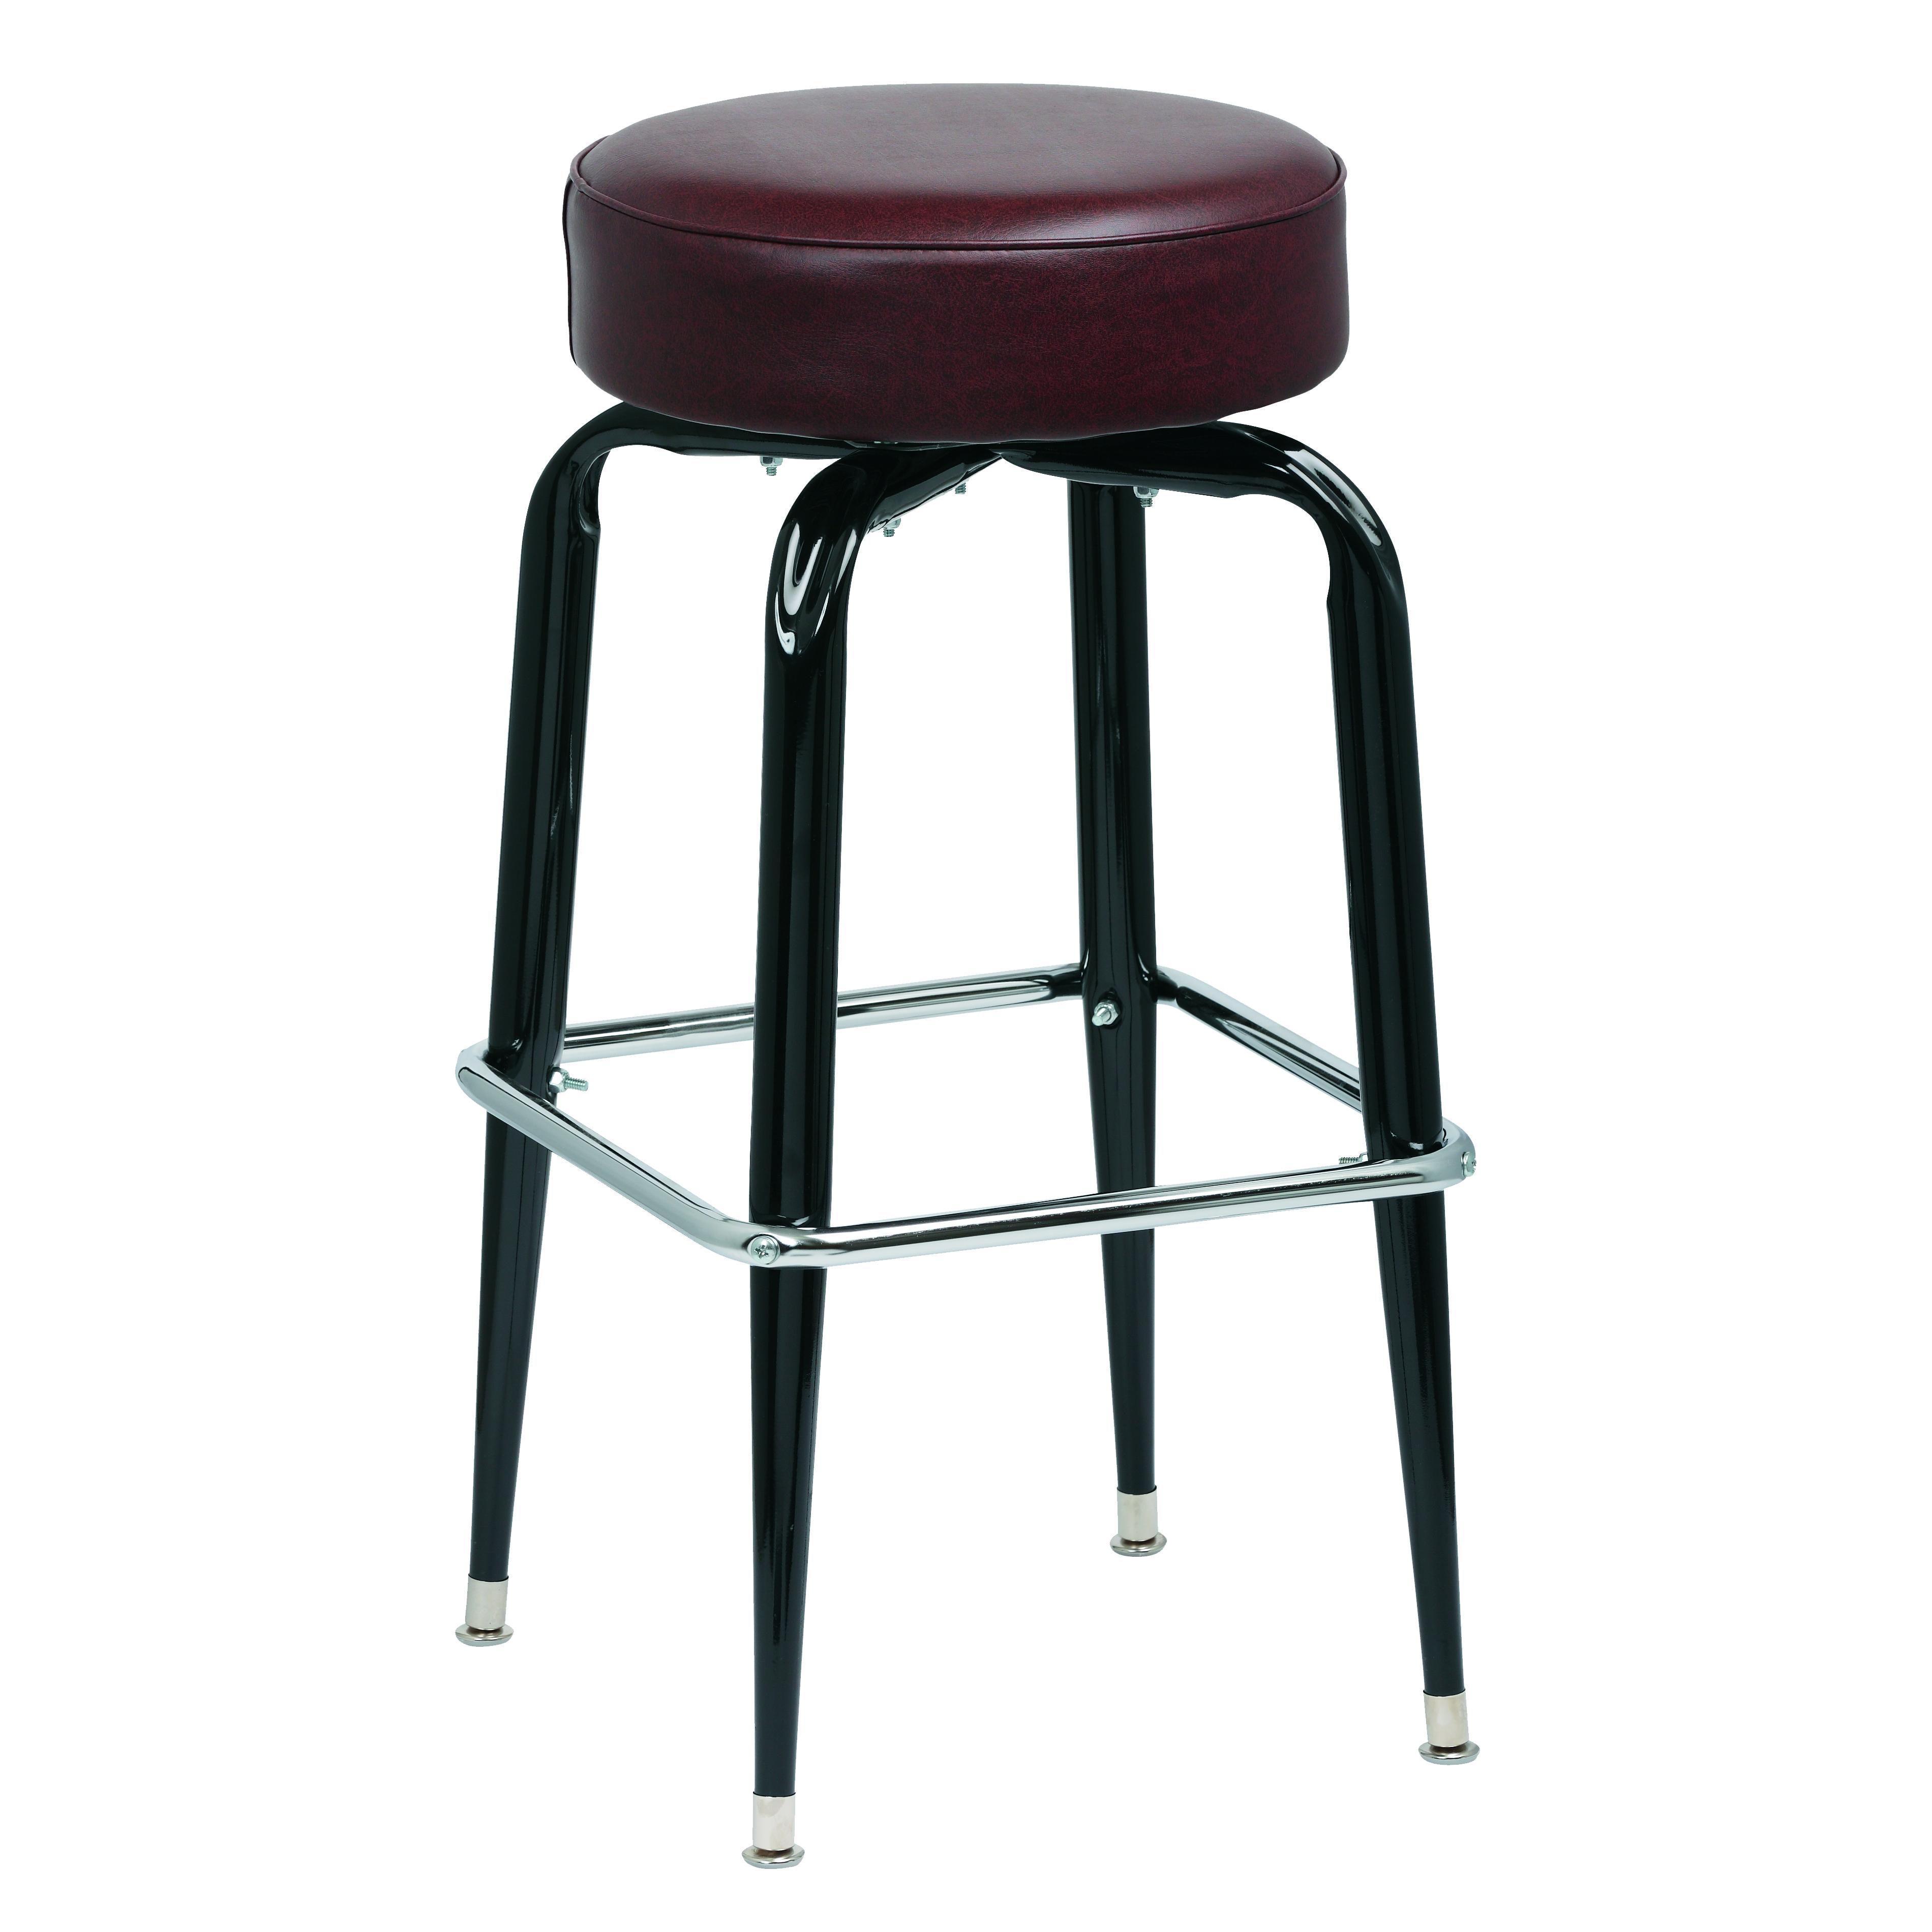 Royal Industries ROY 7723 BRN bar stool, swivel, indoor